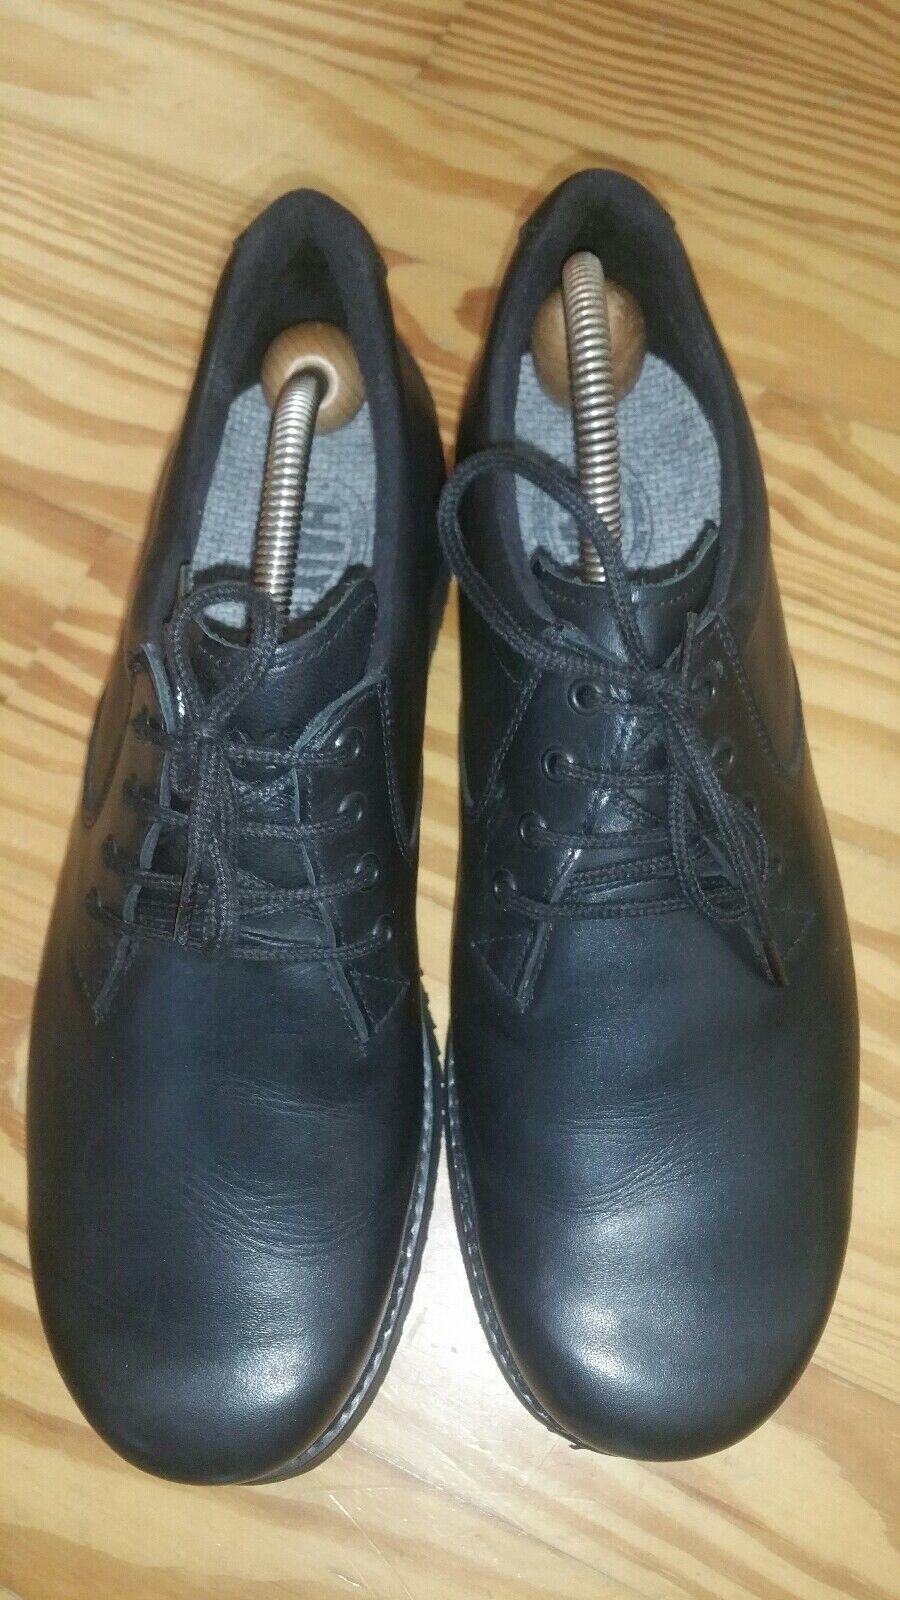 HAIX Messieurs basses service chaussures basses cuir noir T 42 UK 8 NEUF